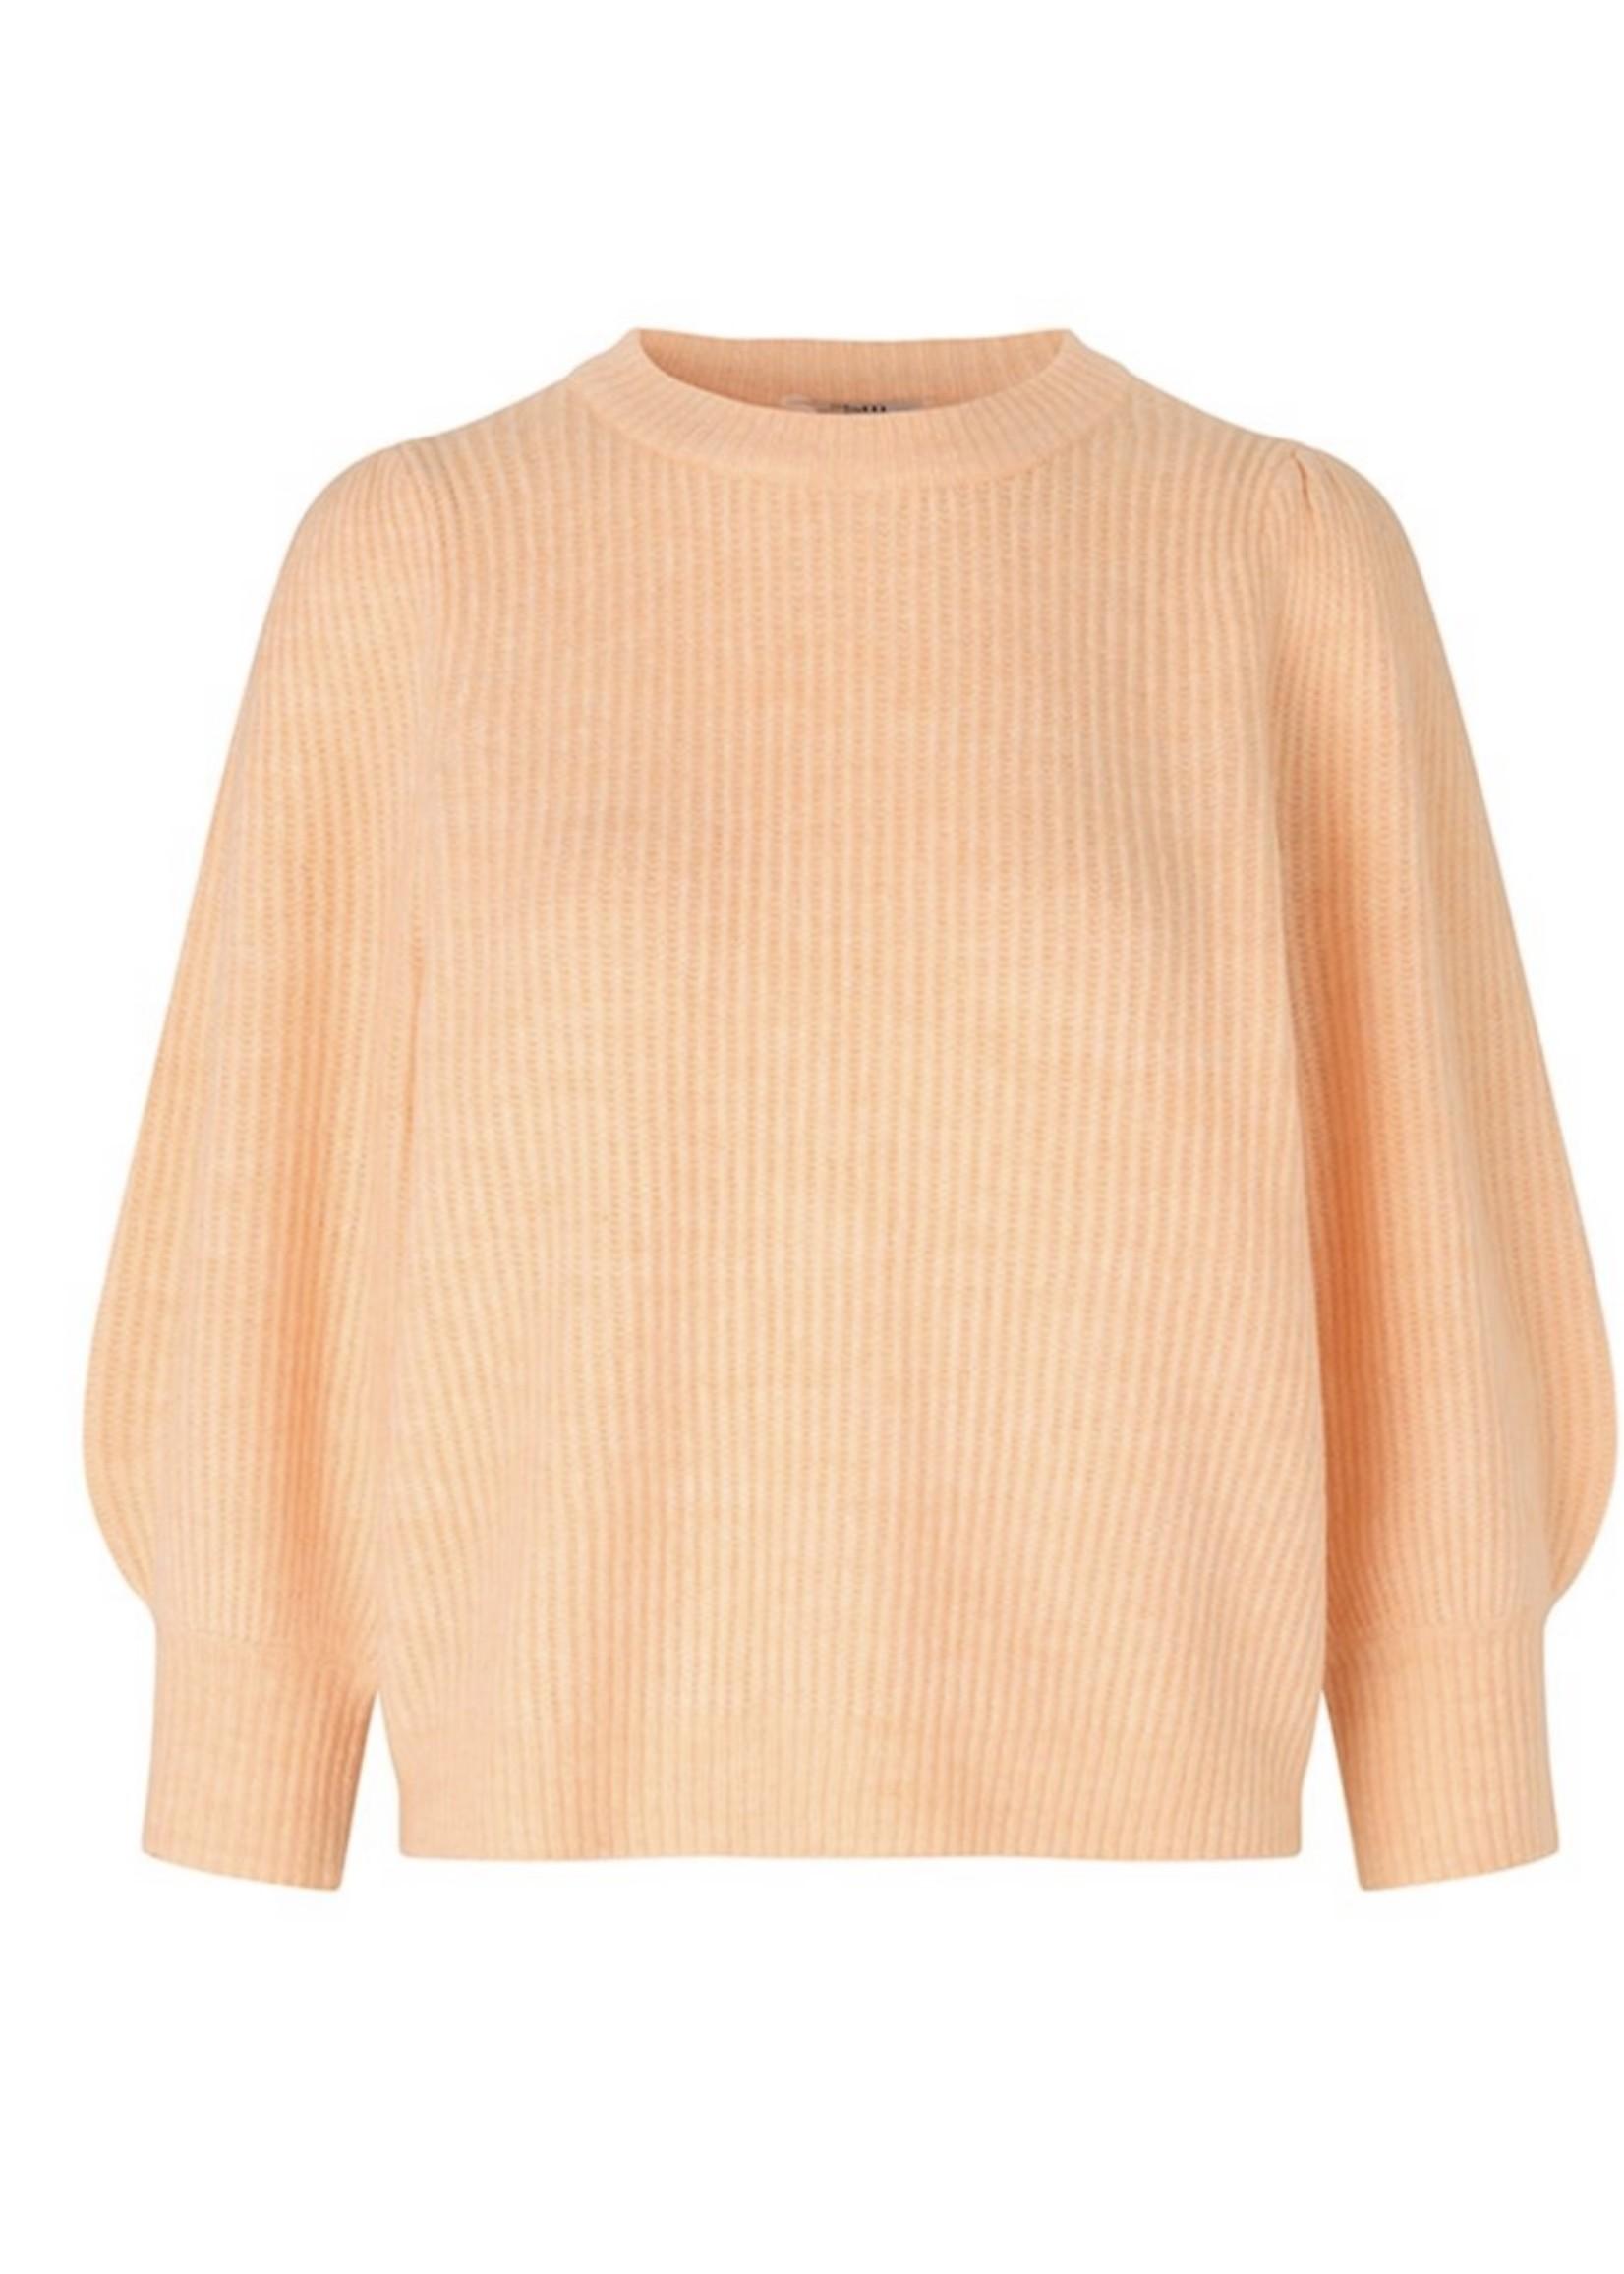 Guts & Goats Eleonore Sweater